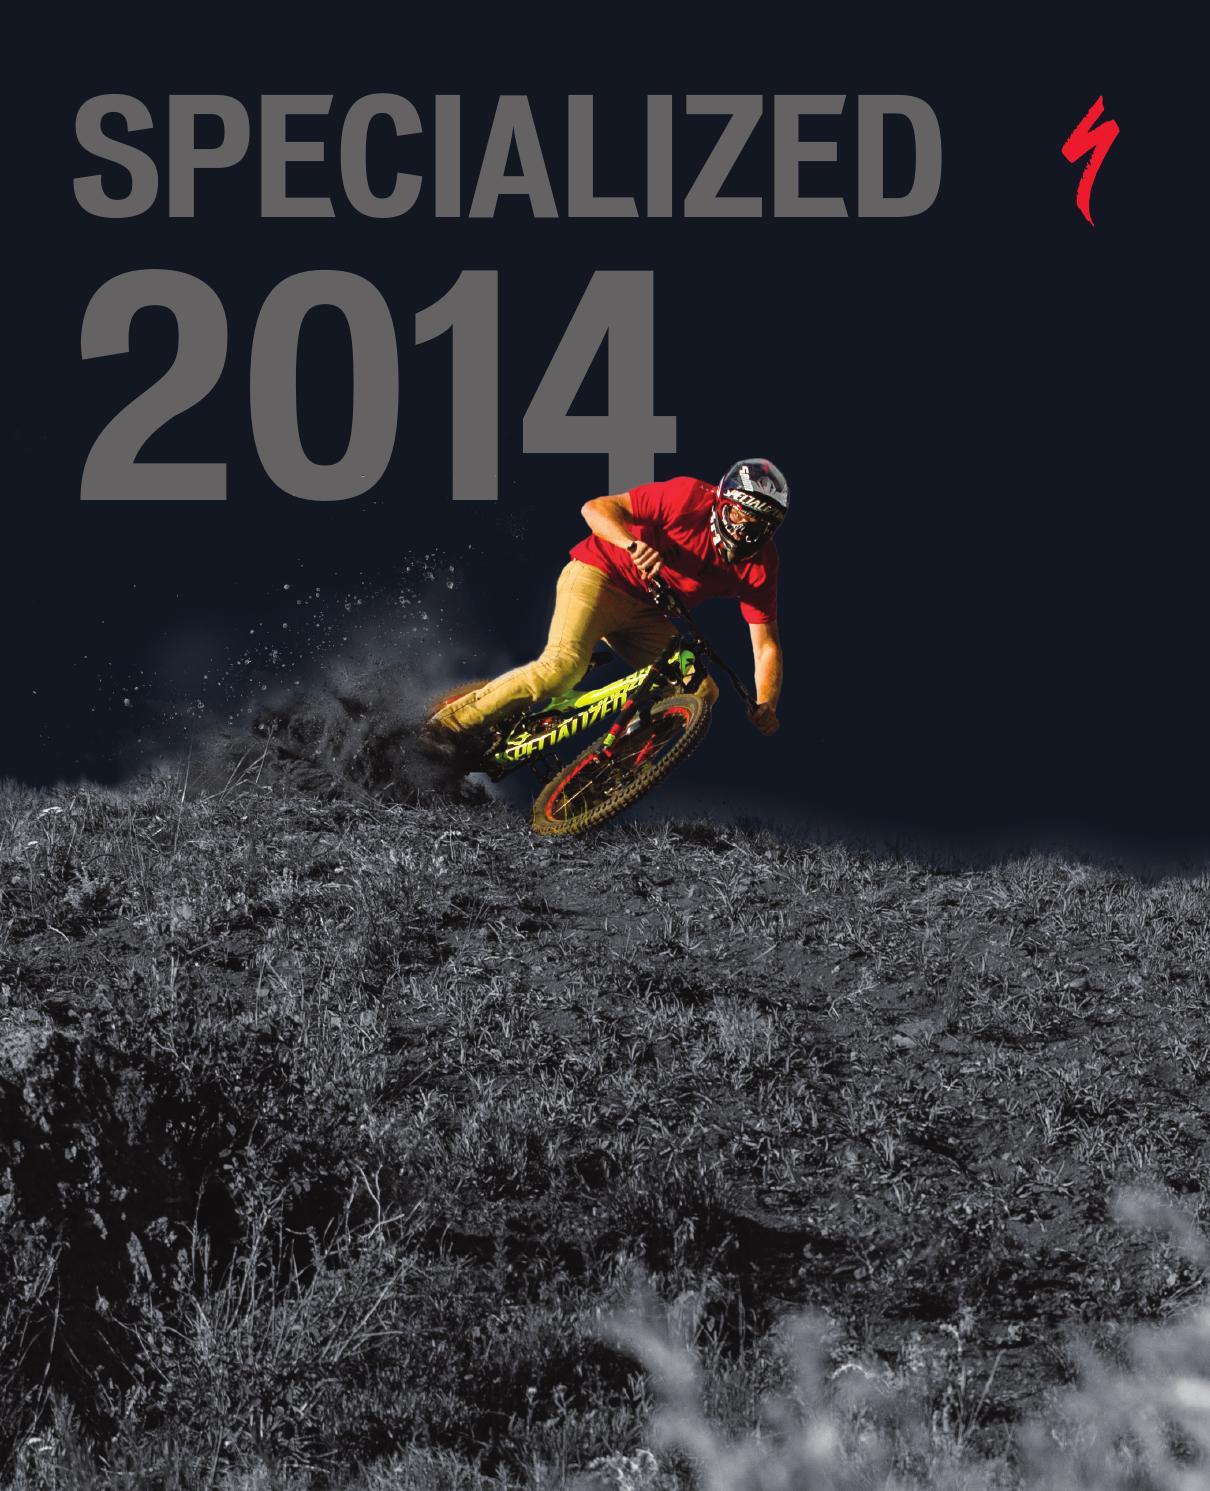 Frankford De Read Consumer: Catálogo General Specialized 2014 By Specialized España